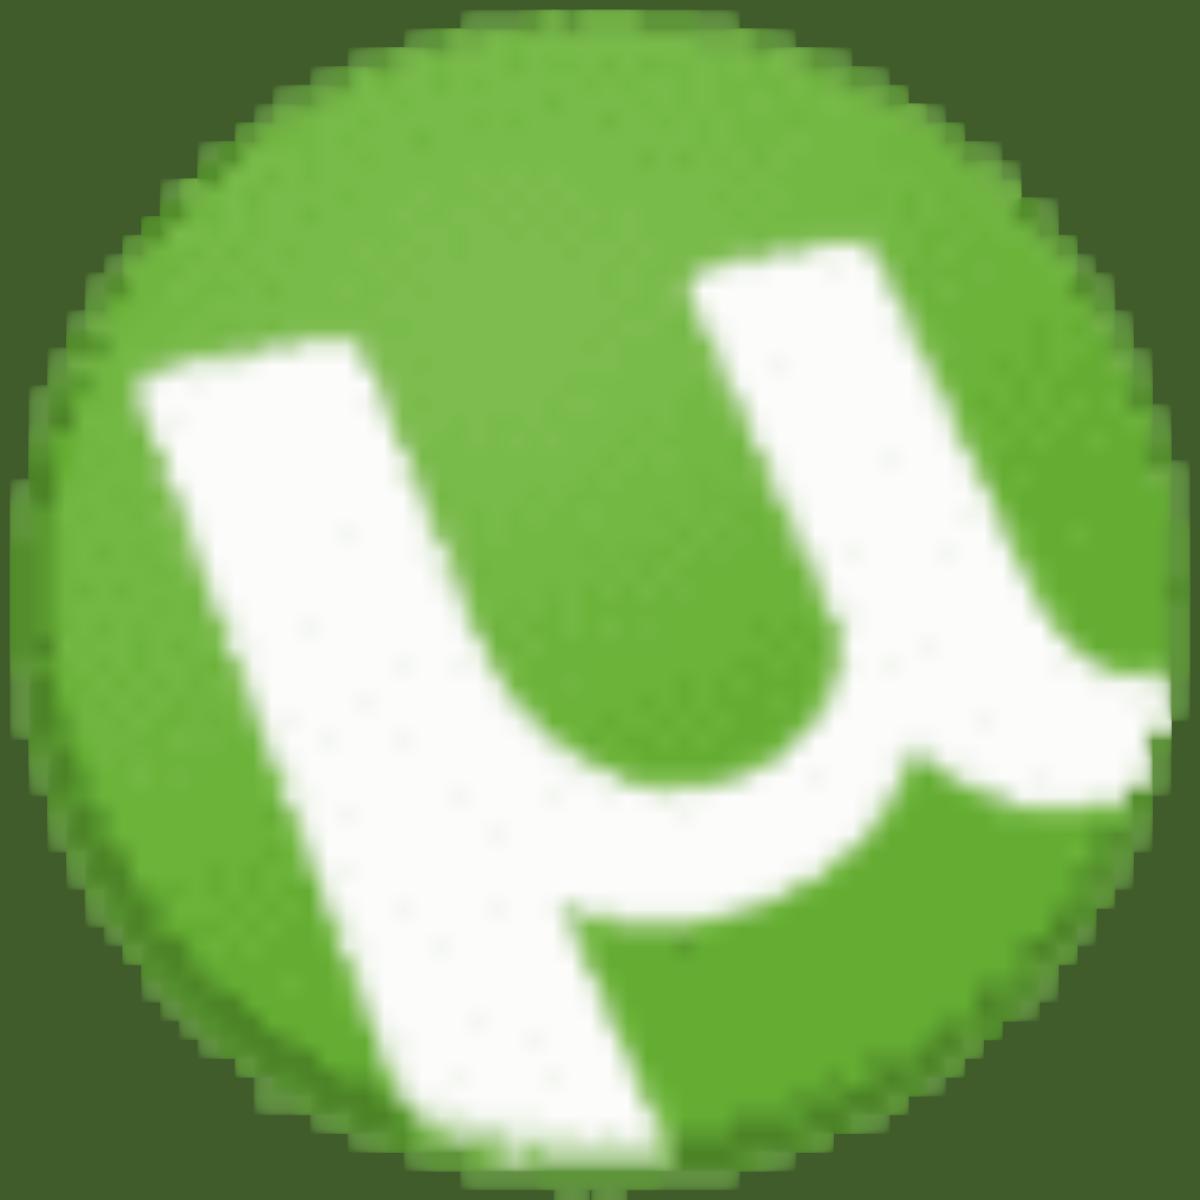 Utorrent Free Download For Windows 10 Apk